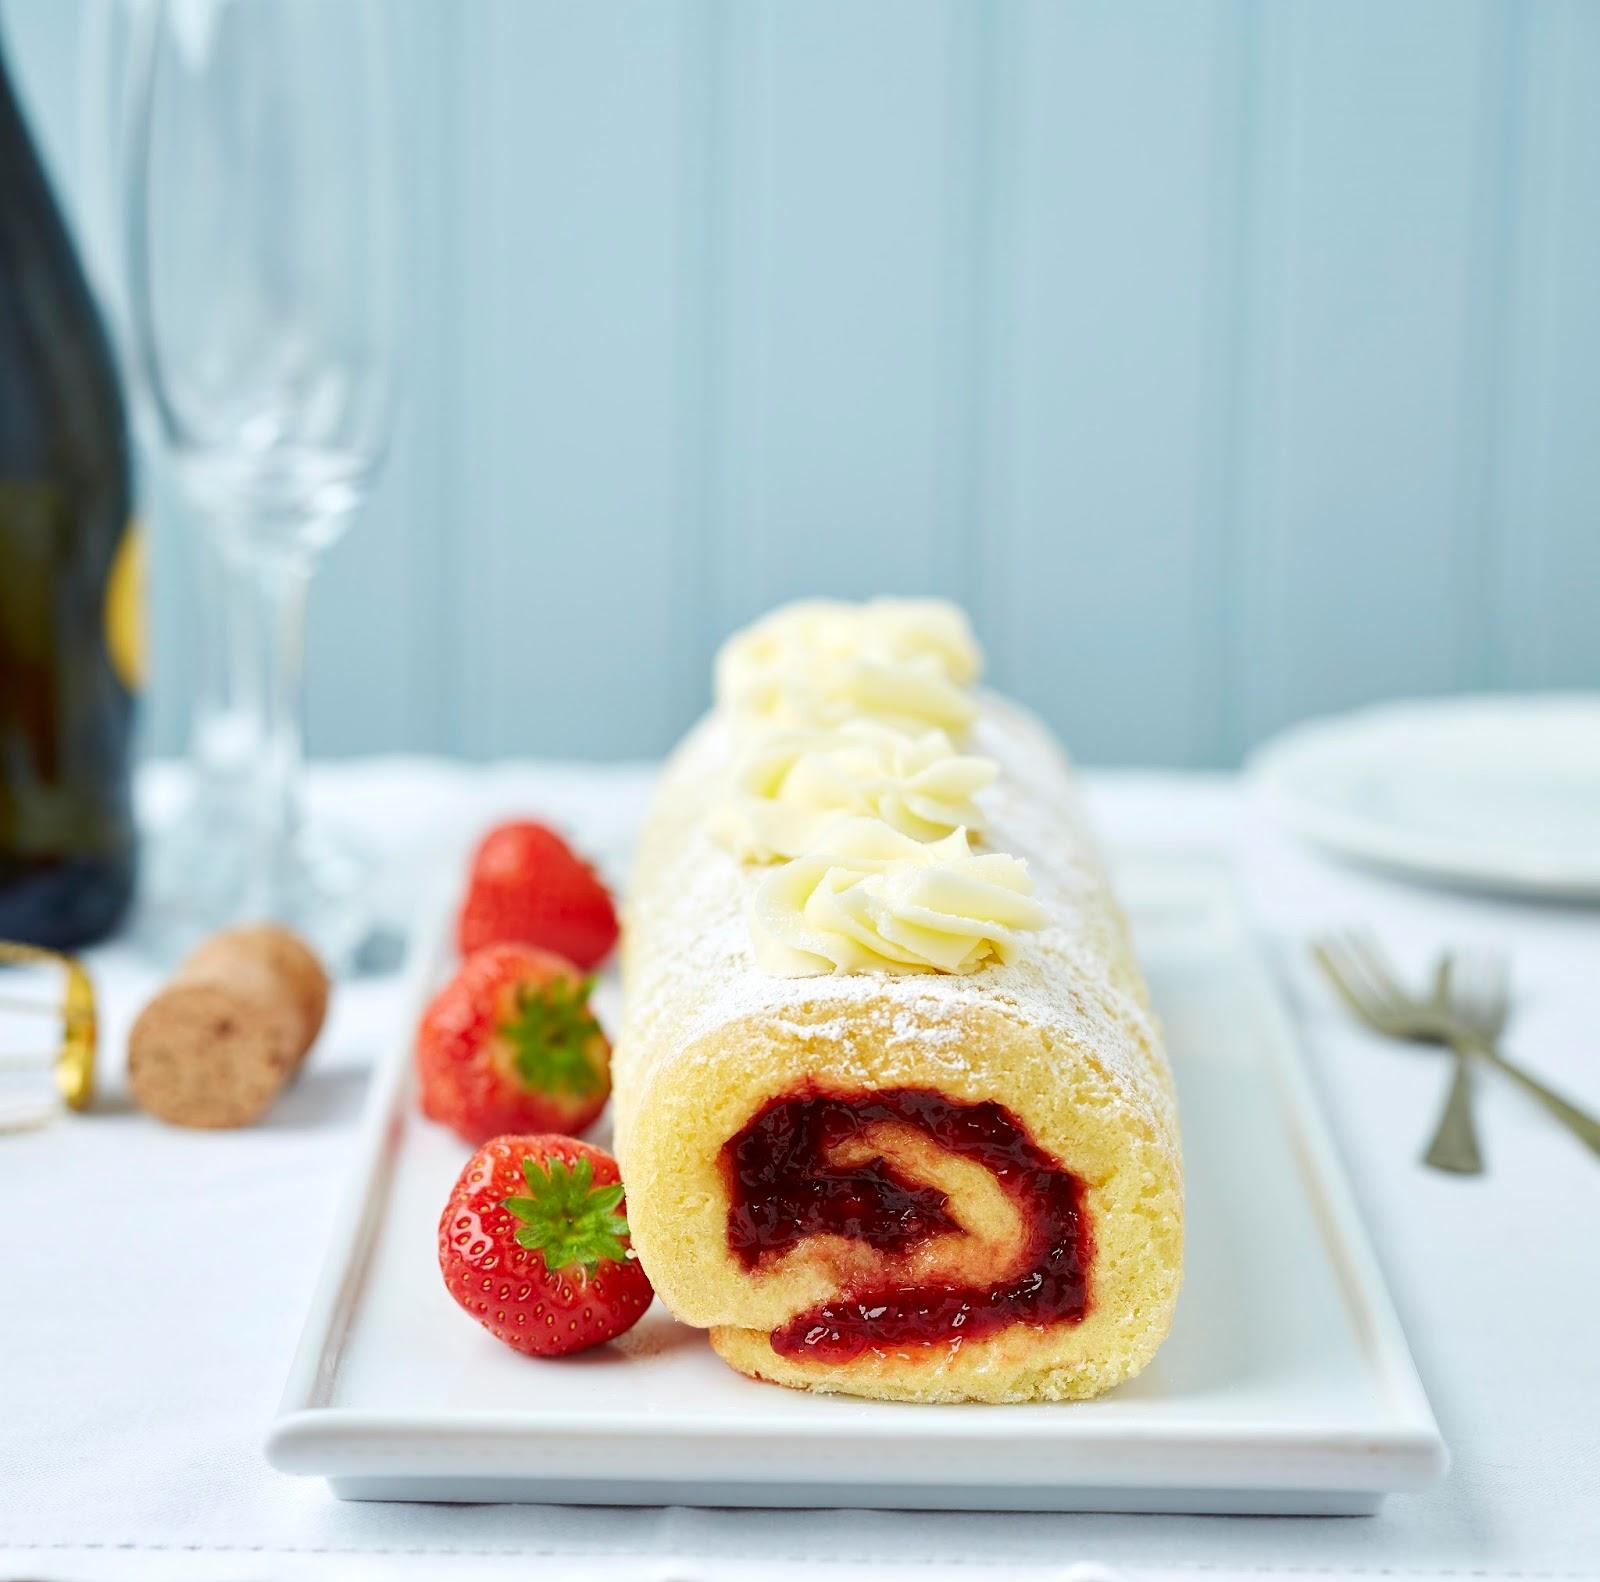 Gluten Free Strawberry Swiss Roll With Prosecco Buttercream